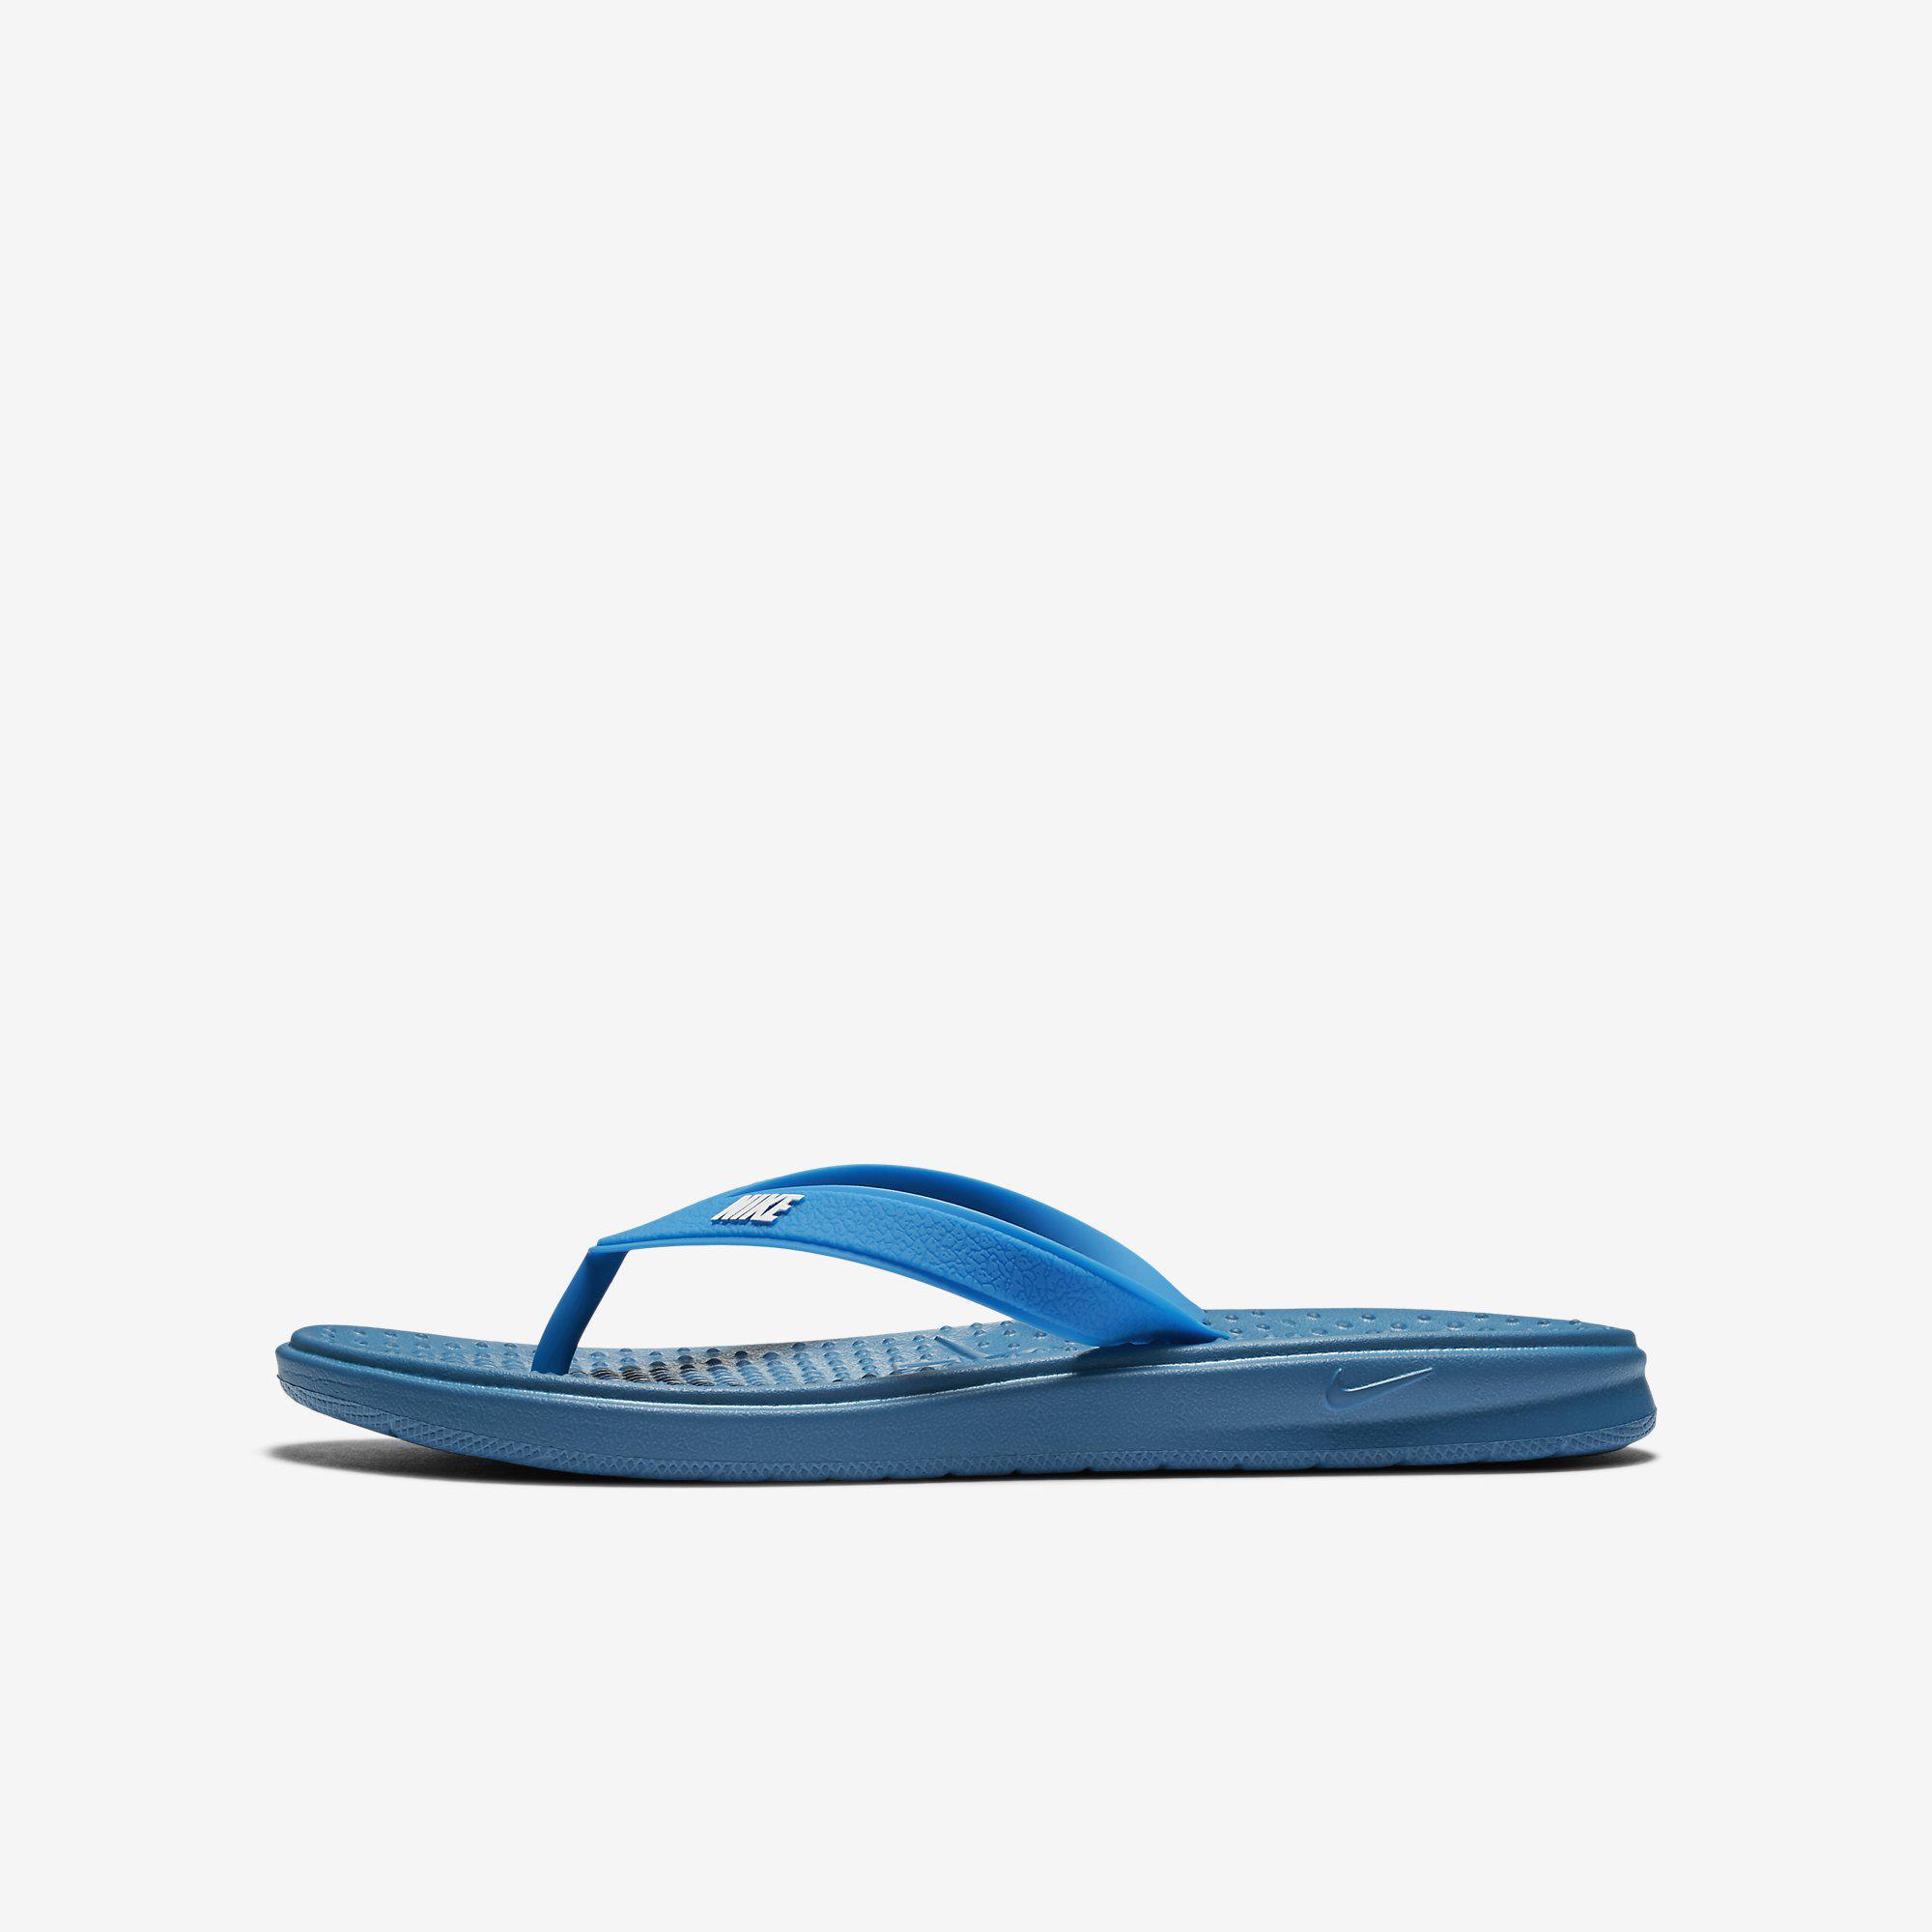 4193fce8bc85 Nike Boys Solay Thong (Flip Flops) - Industrial Blue - Tennisnuts.com